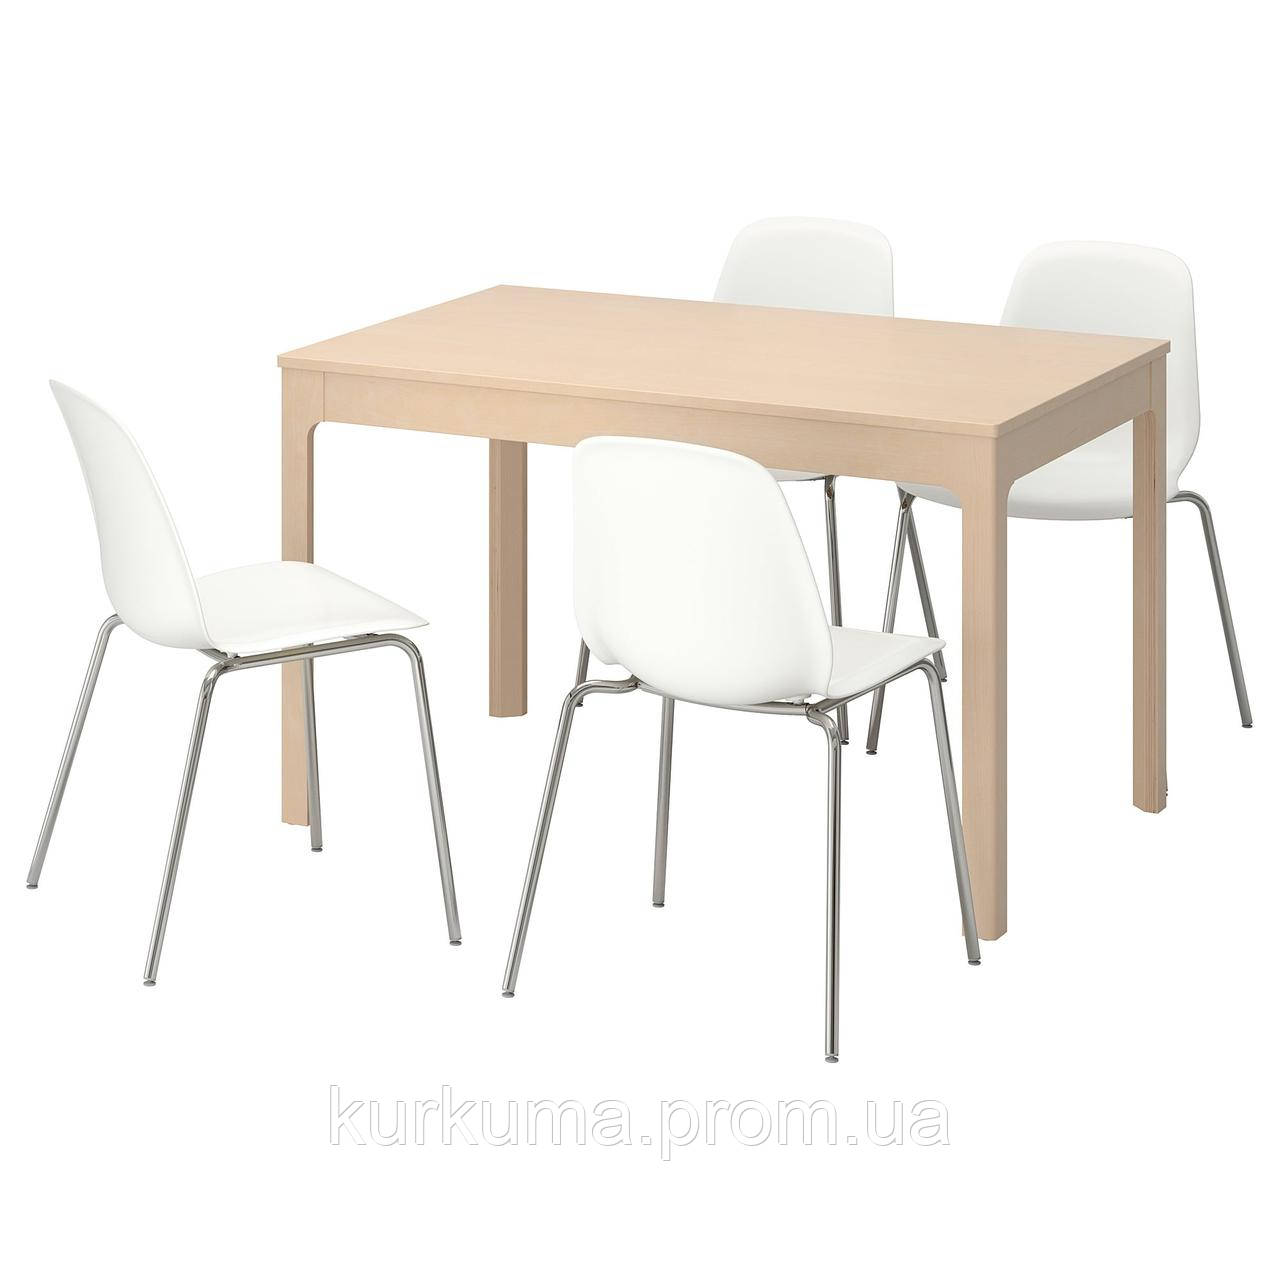 IKEA EKEDALEN/LEIFARNE Стол и 4 стула, береза, белый  (392.298.41)